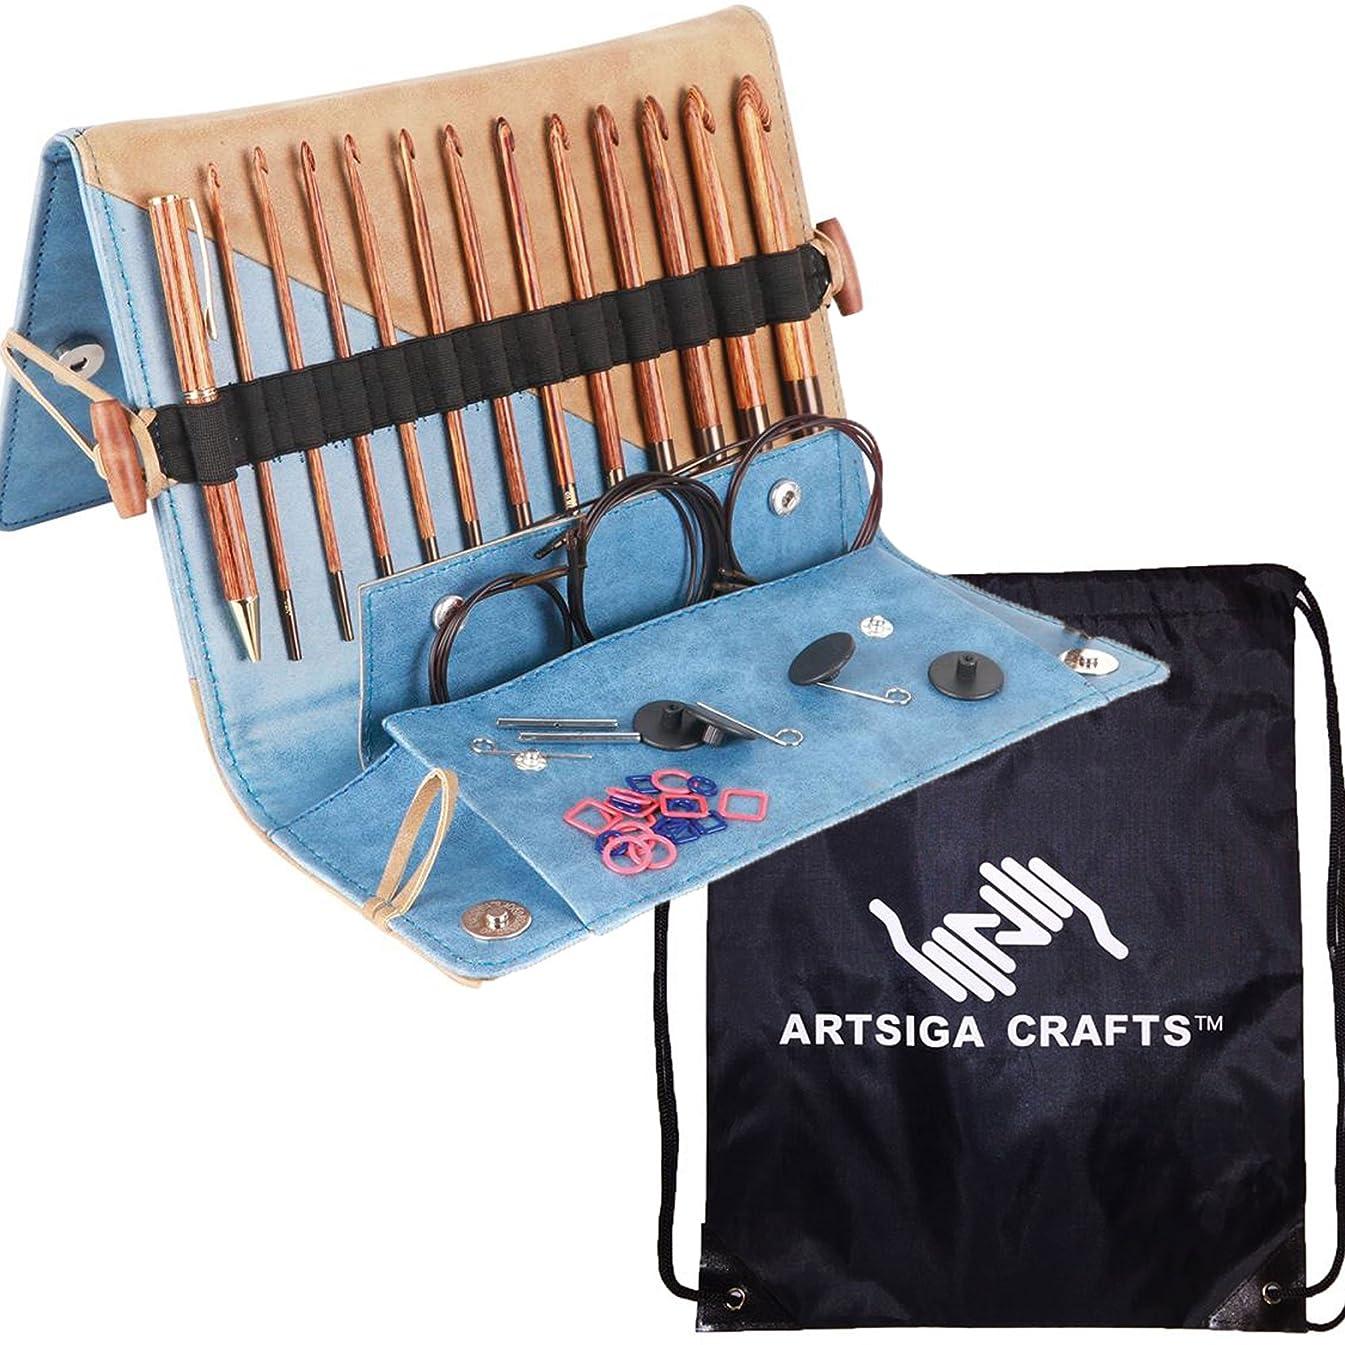 Knitter's Pride Tunisian Crochet Hook Ginger Set Bundle with 1 Artsiga Crafts Project Bag